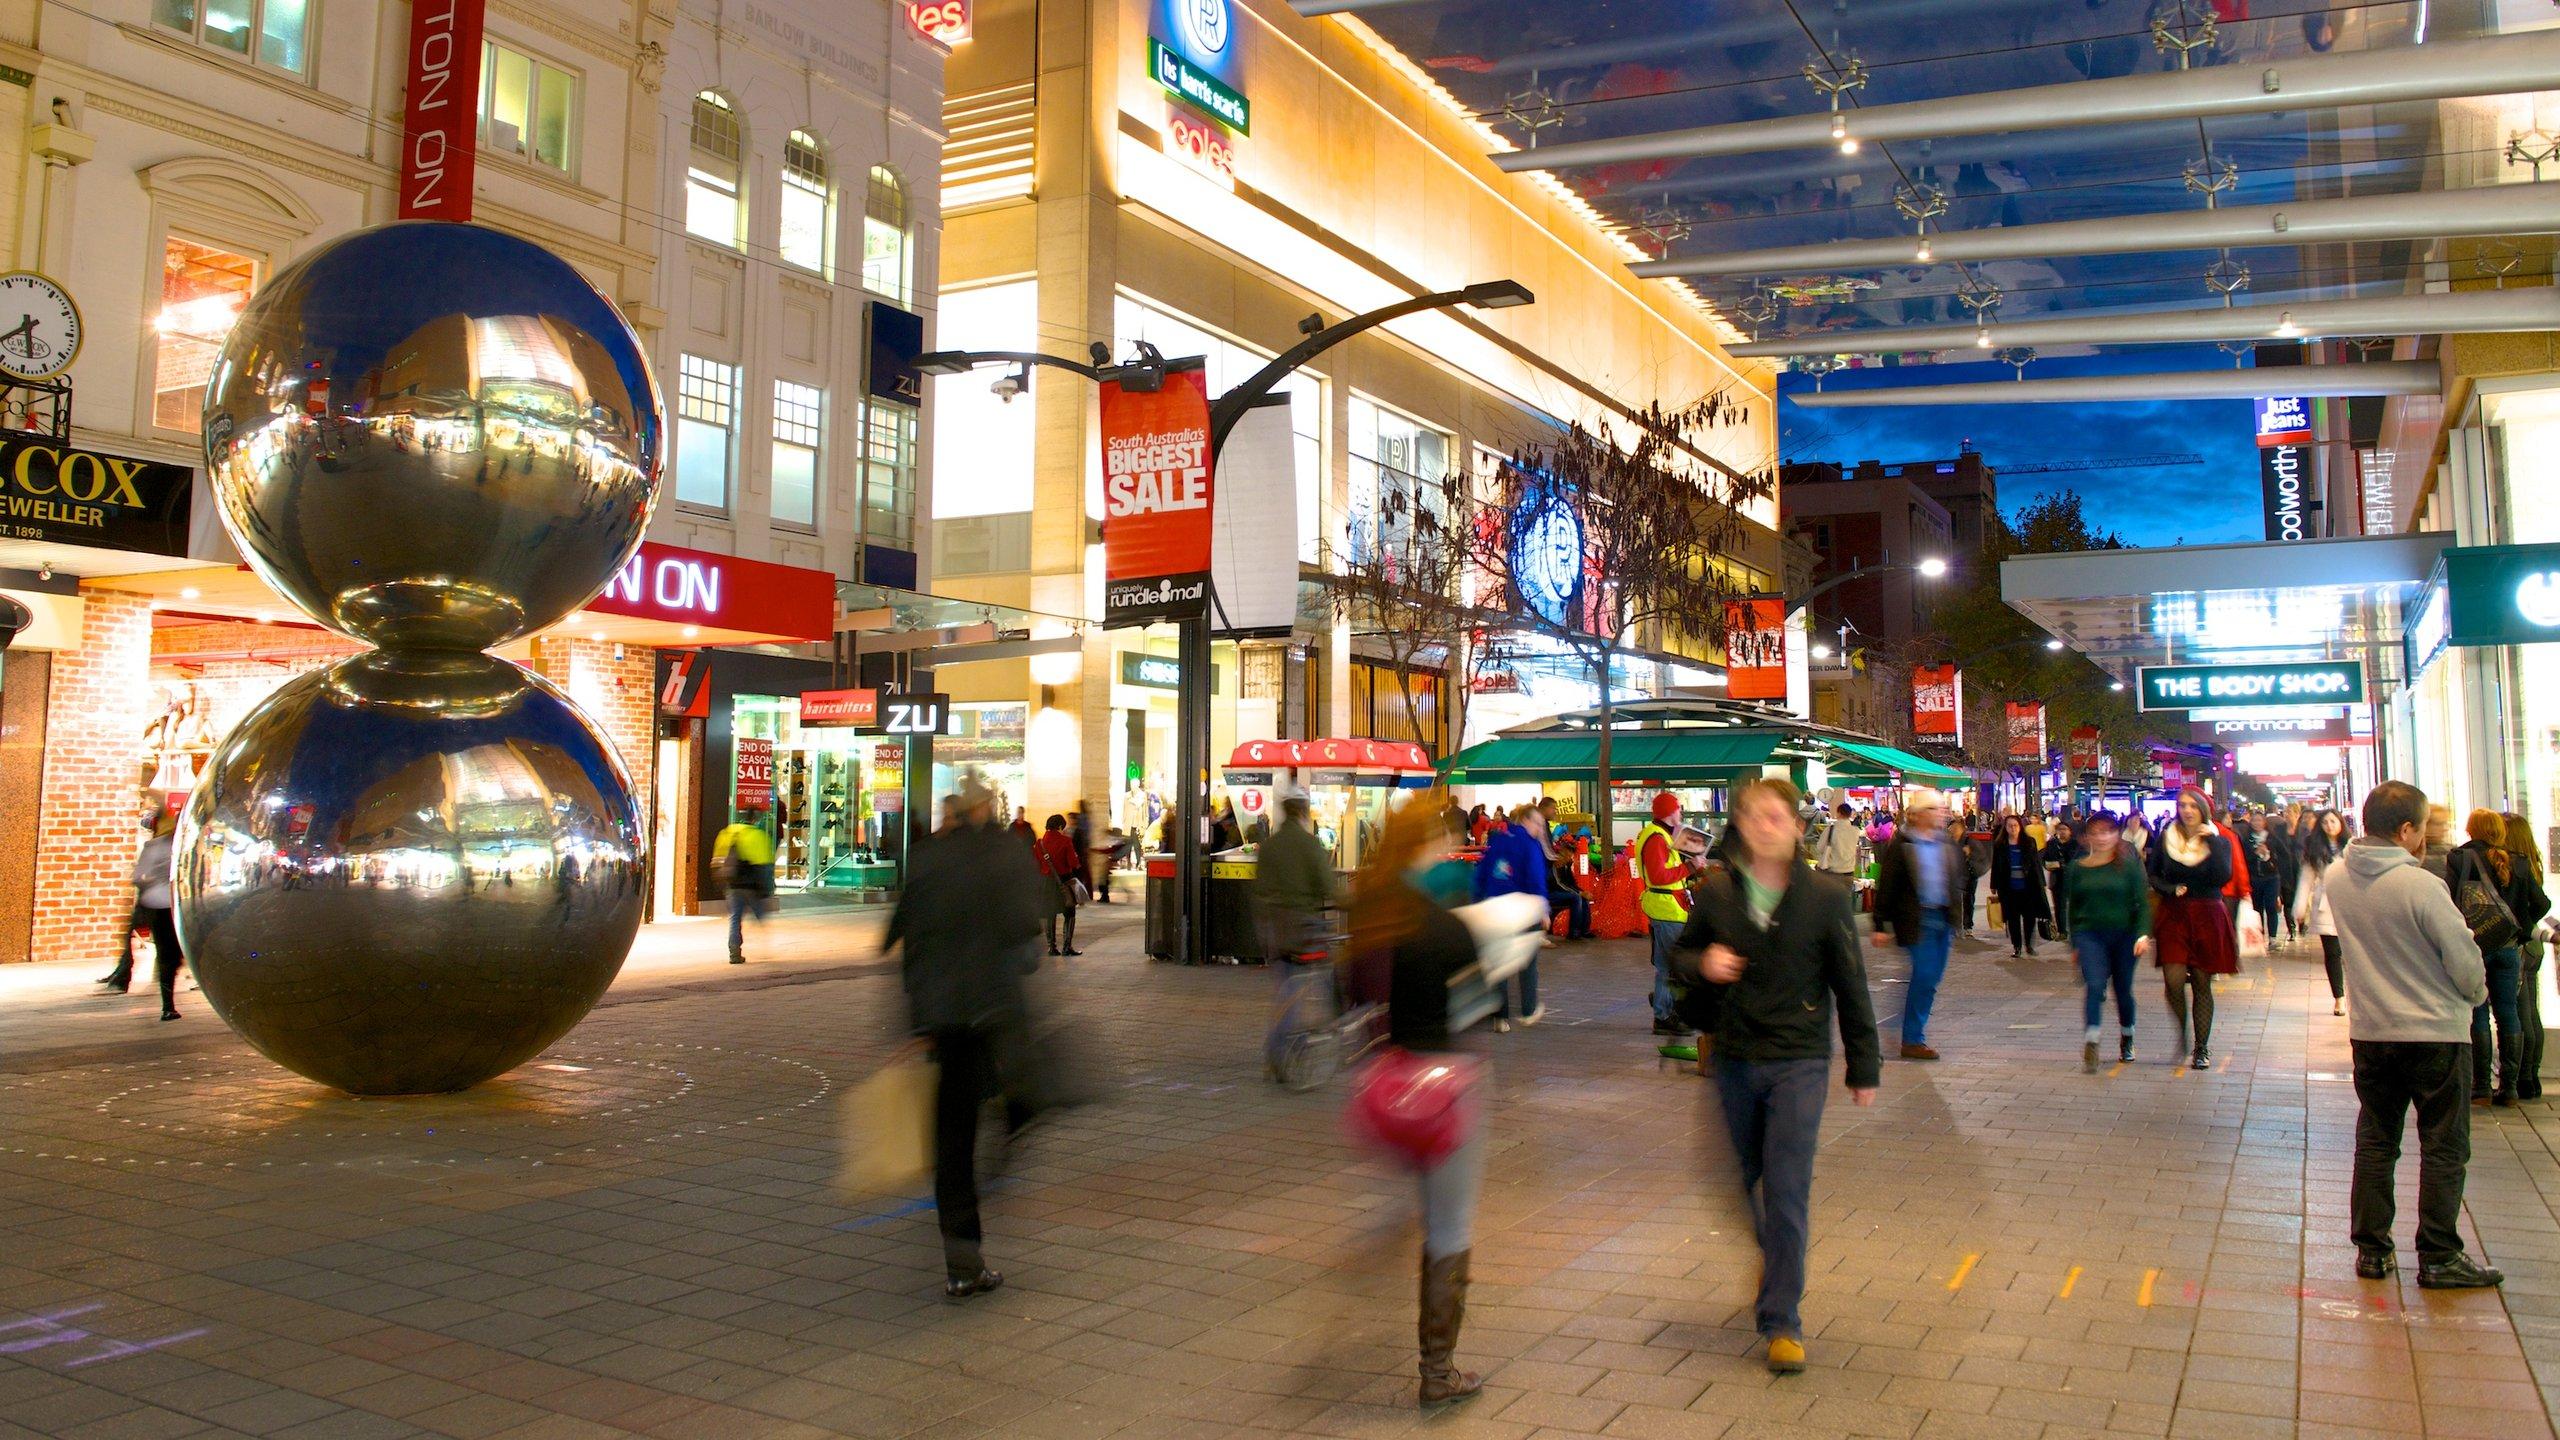 Adelaide Central Business District, Adelaide, South Australia, Australia